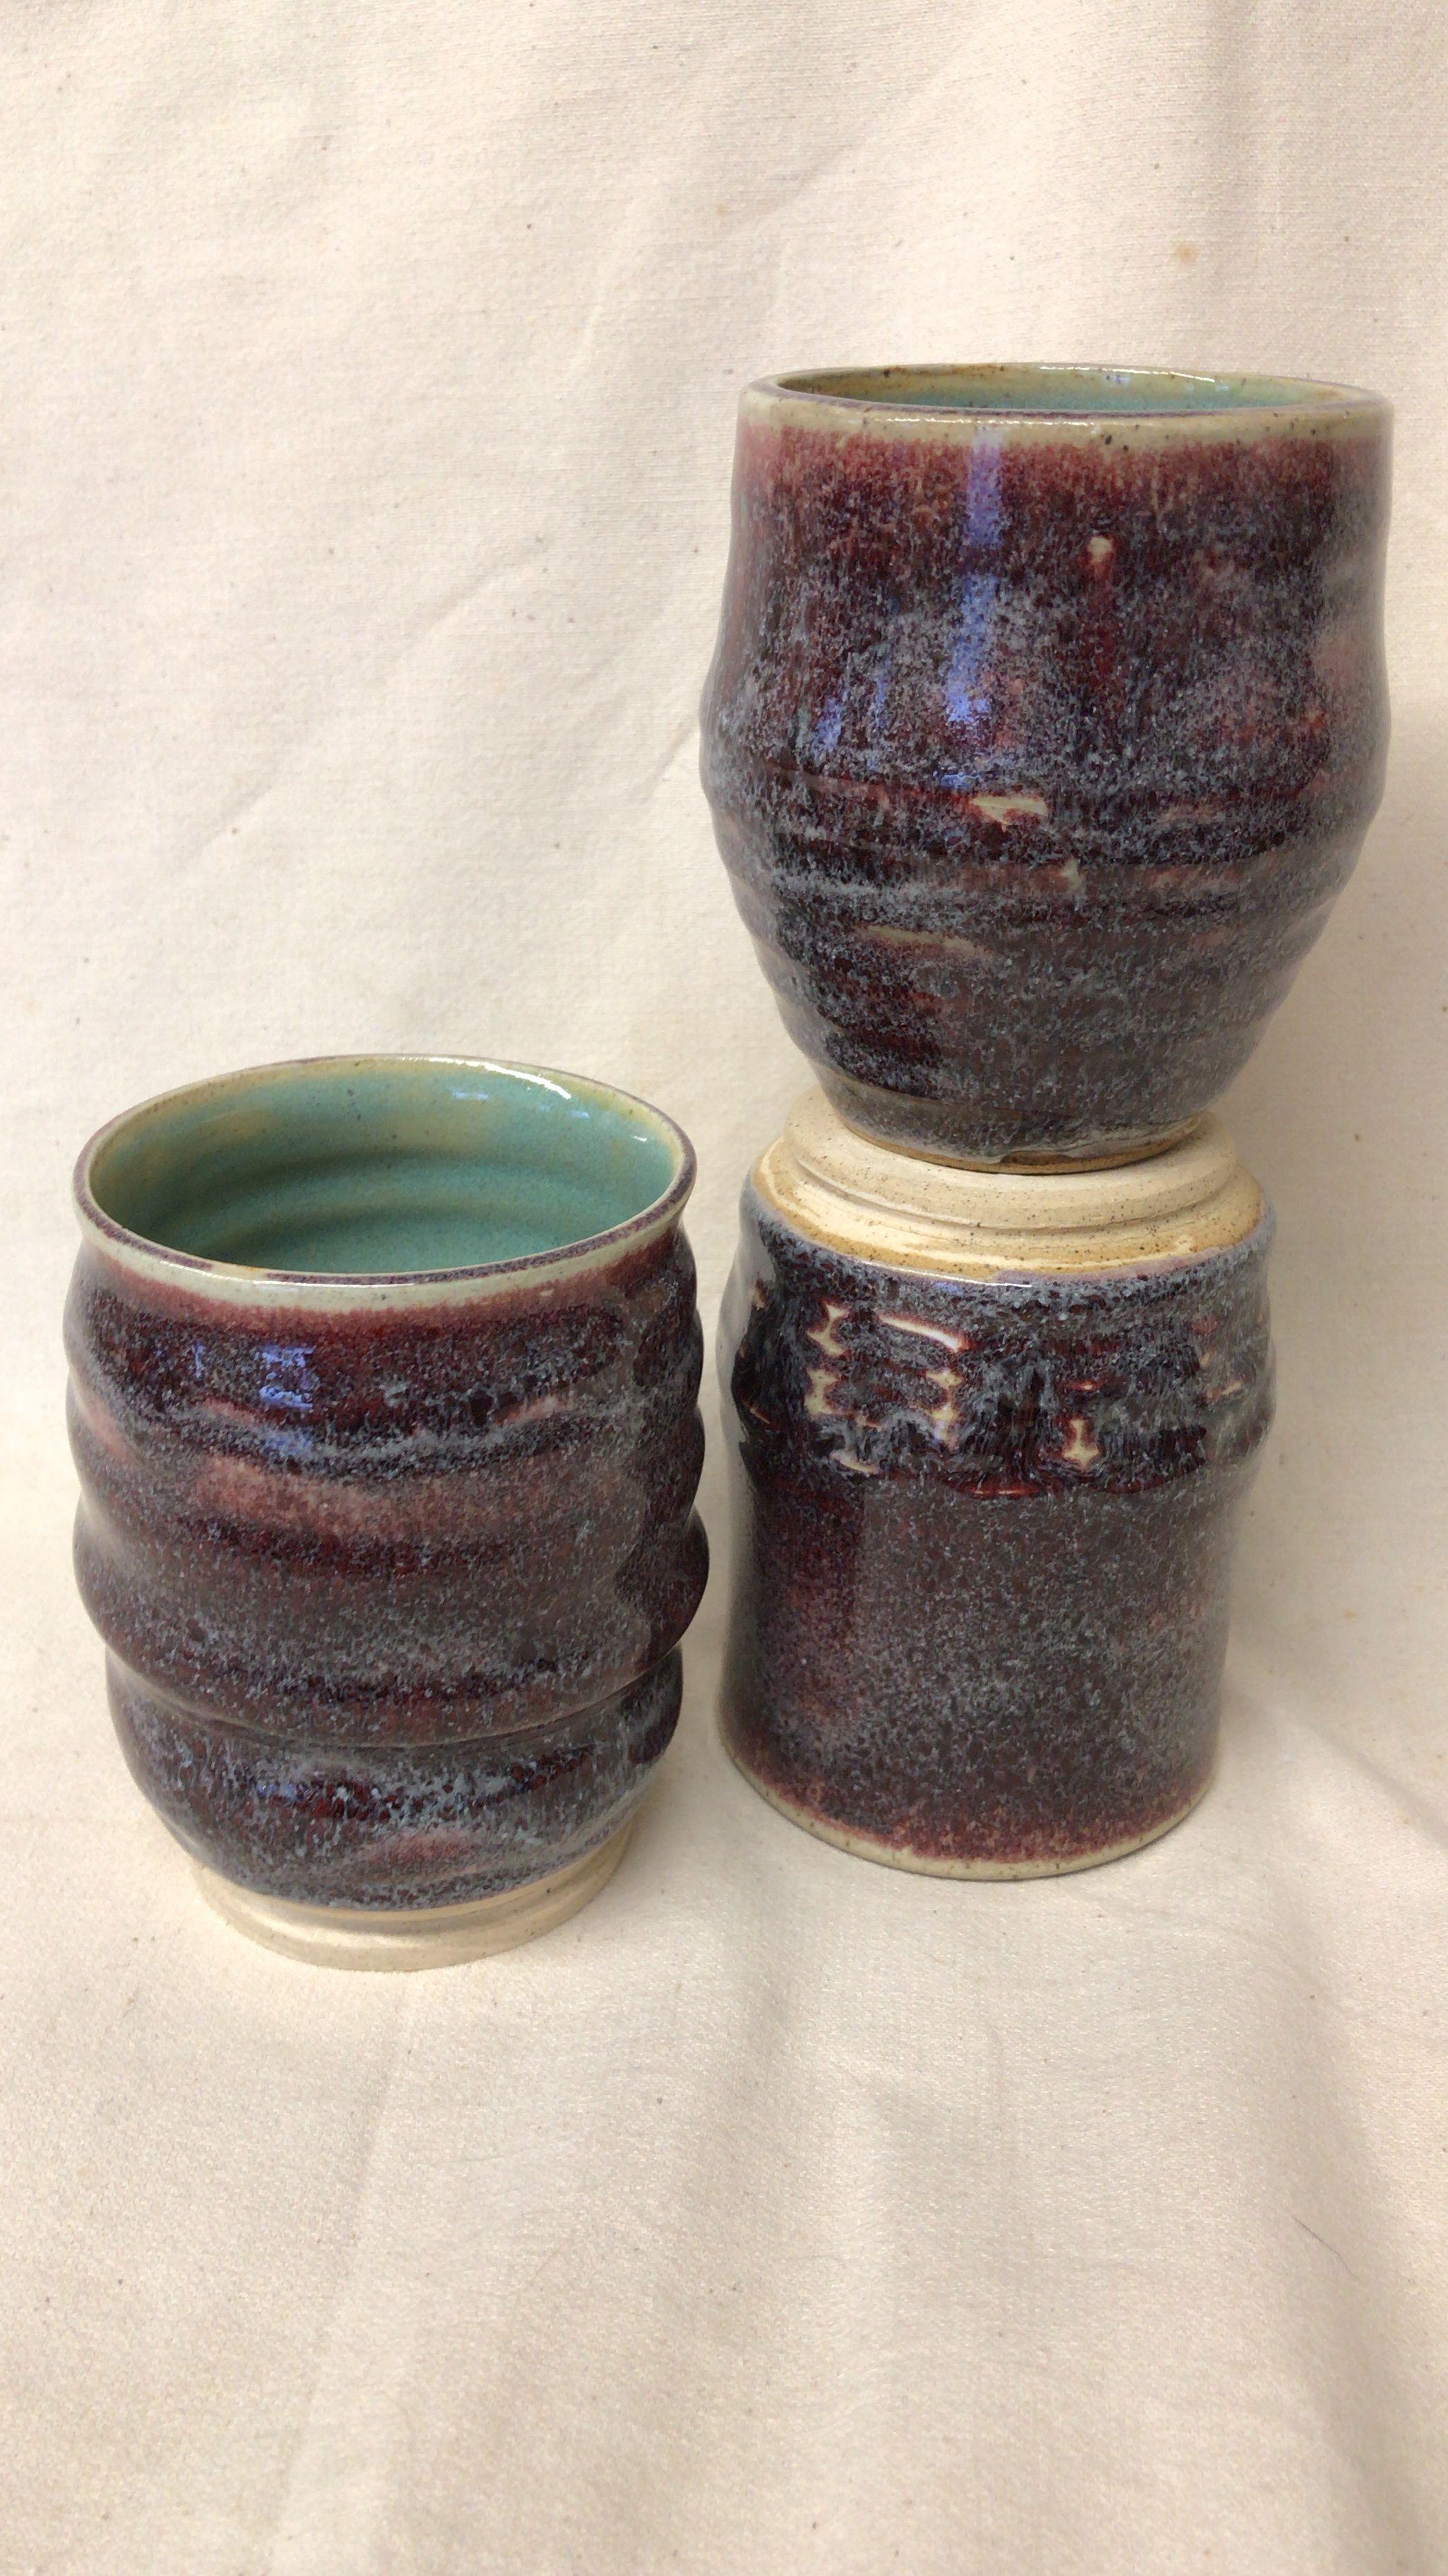 Pasceramics Coyote Glaze Glaze Pottery Photo And Video